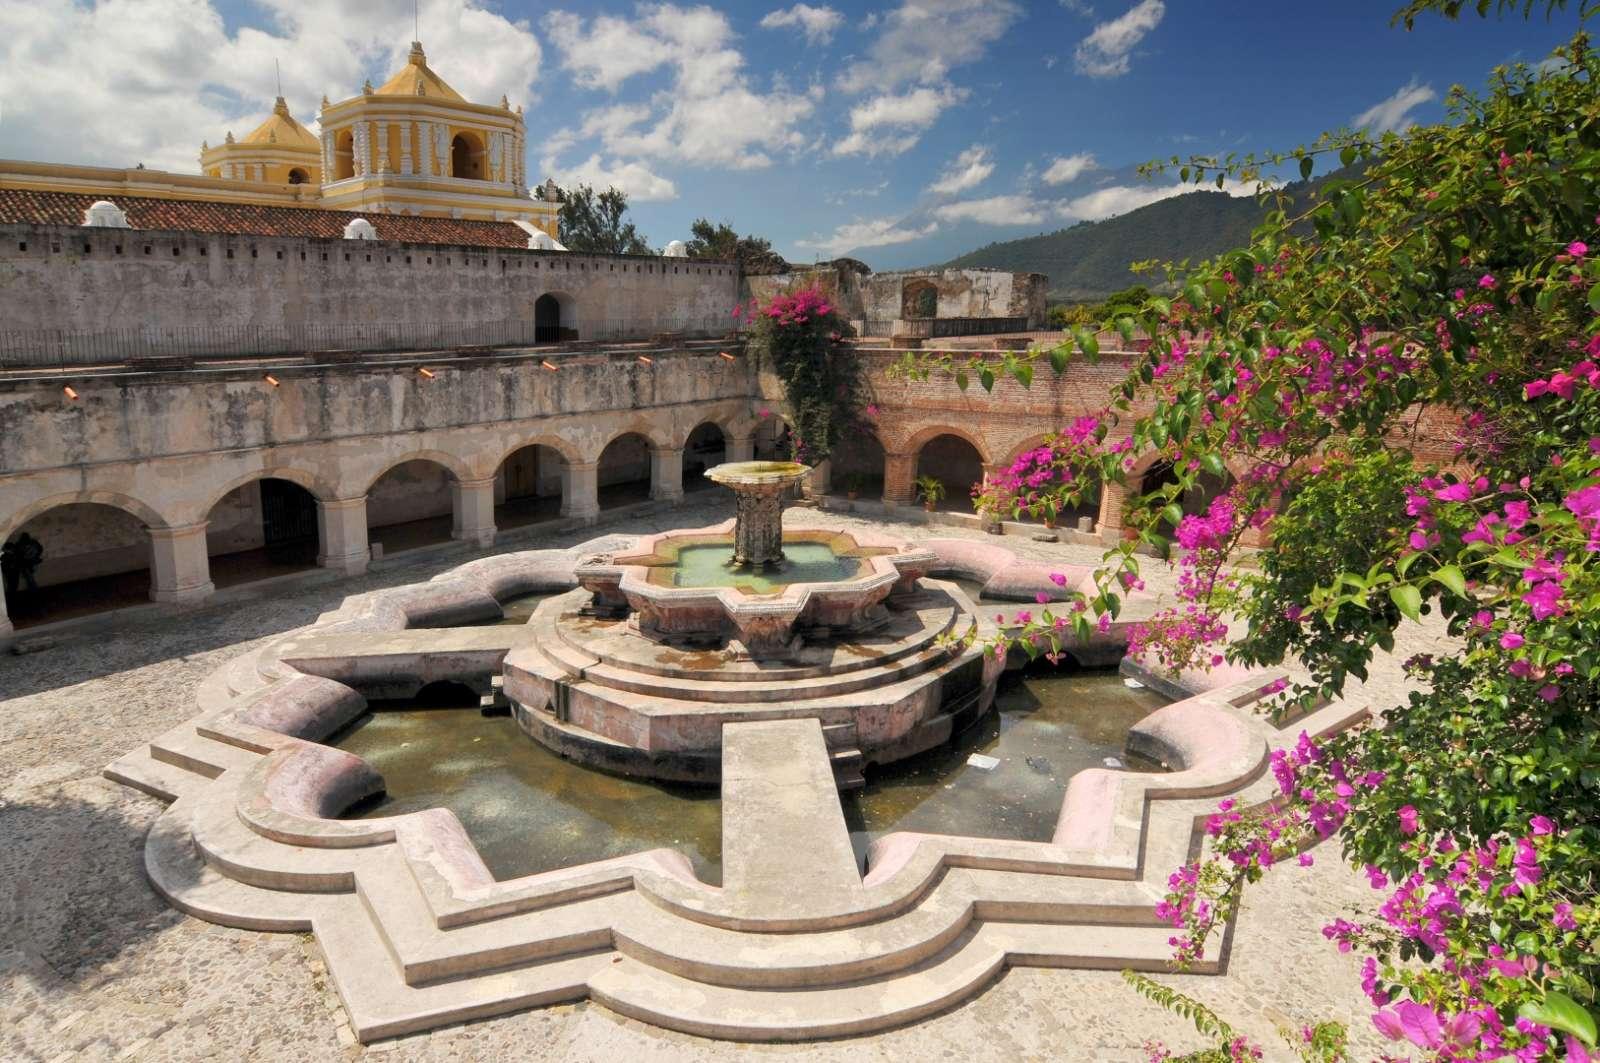 Courtyard at La Merced church in Antigua, Guatemala